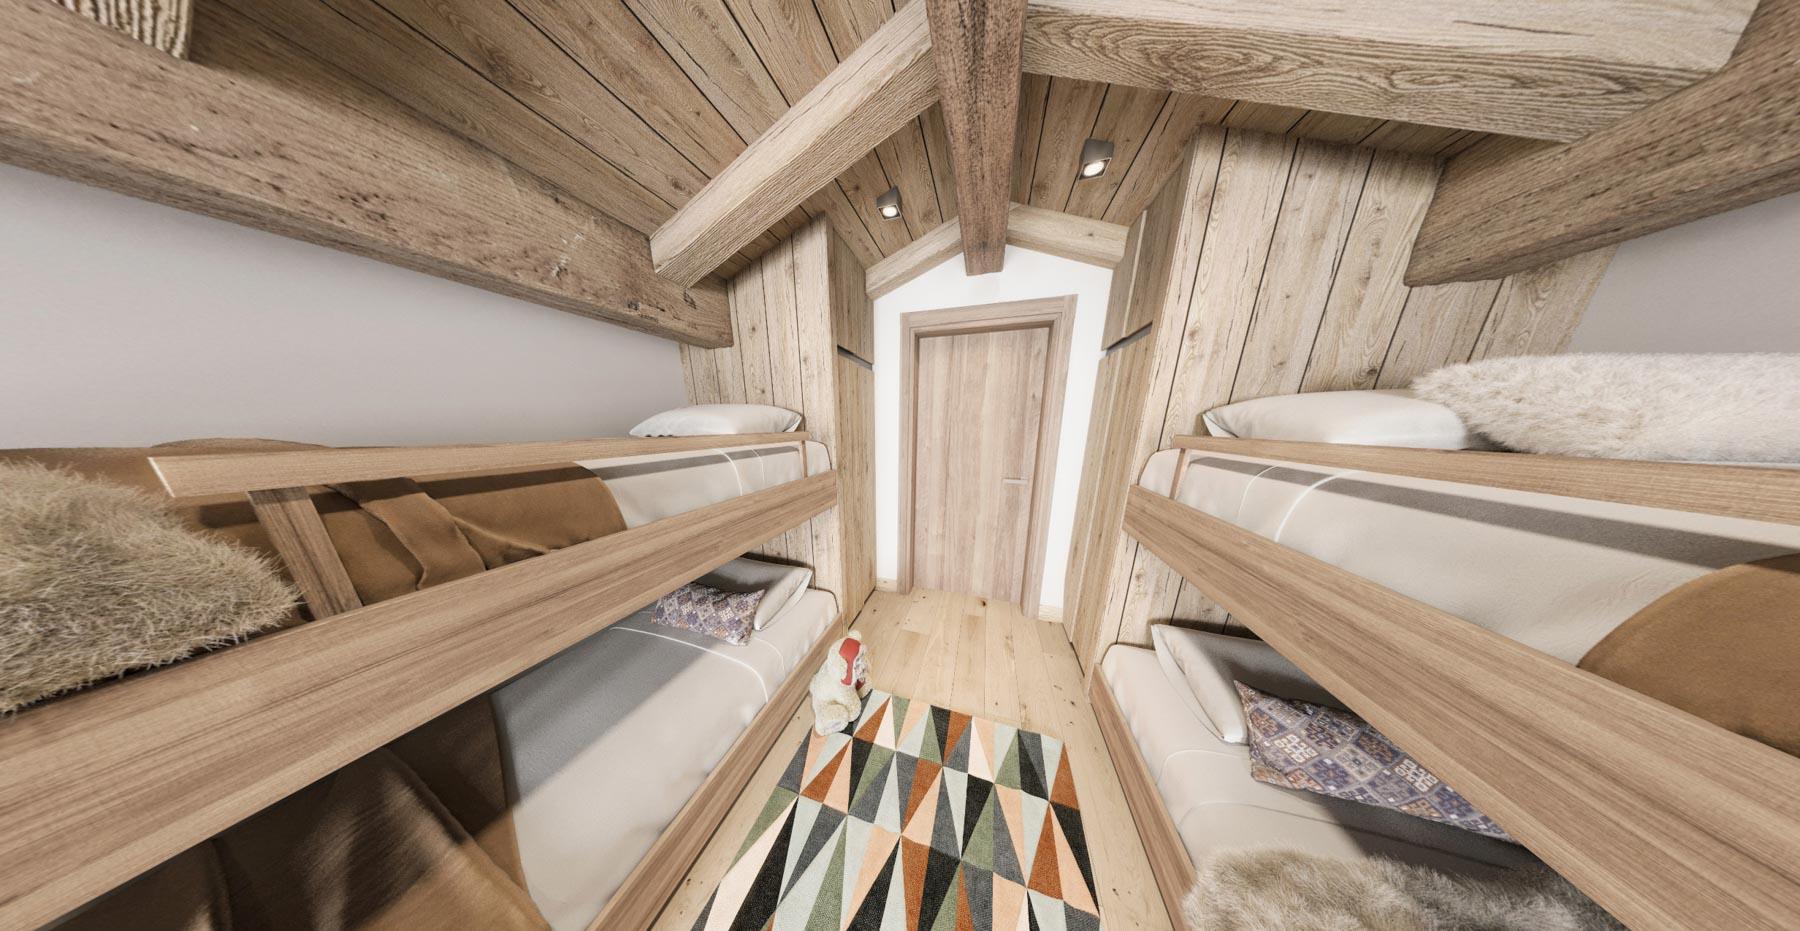 Gite Blanc Example Bunk Room